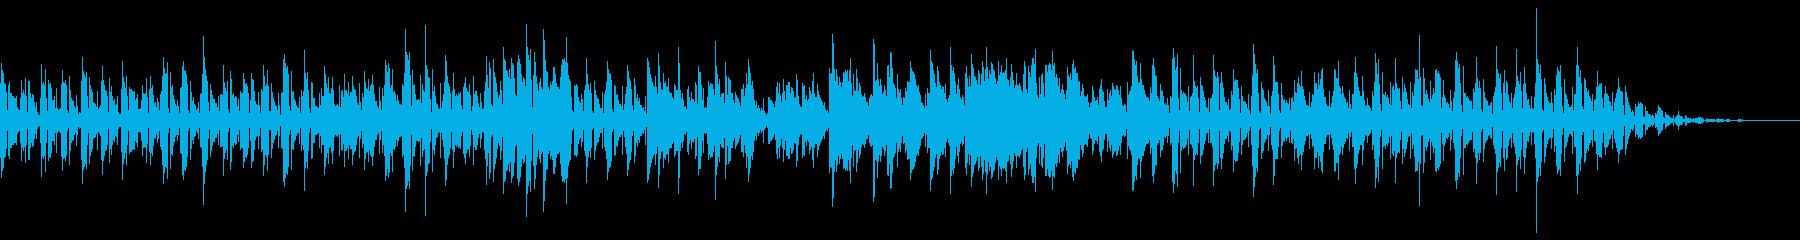 Jazzy で軽快なフュージョンの再生済みの波形